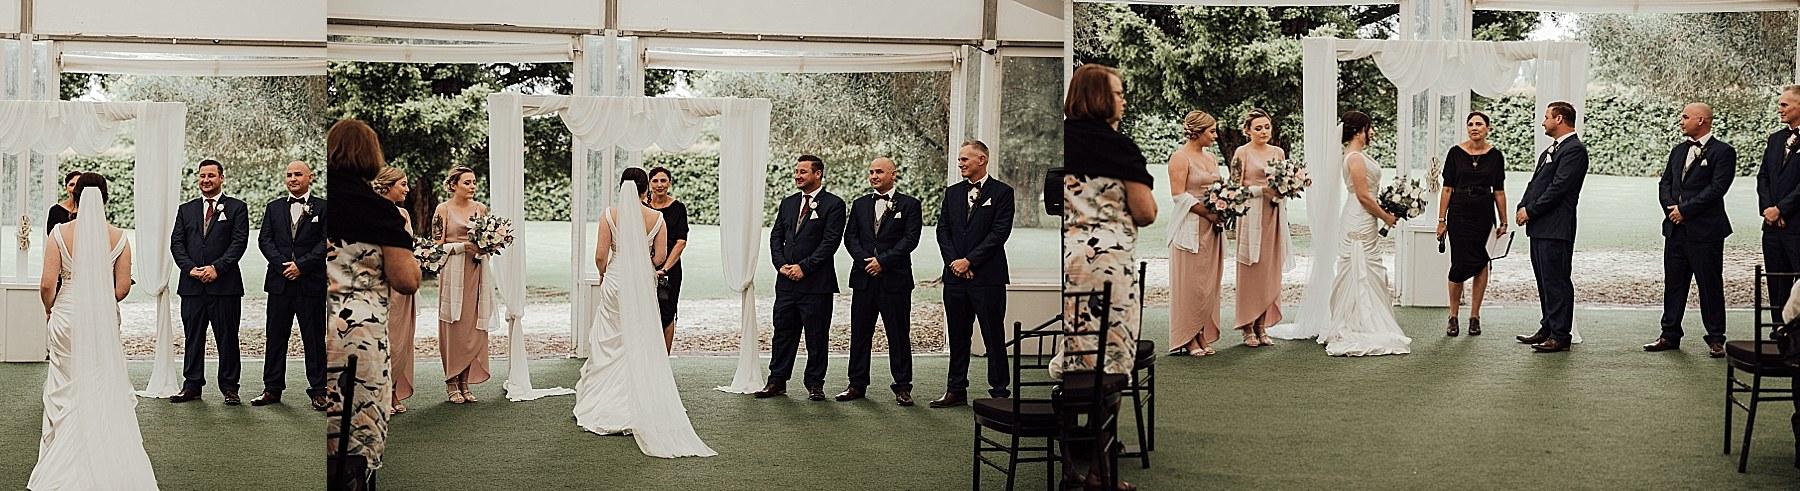 Allely Estate Wedding Auckland Wedding Photographer - Jana & Laurie_0114.jpg